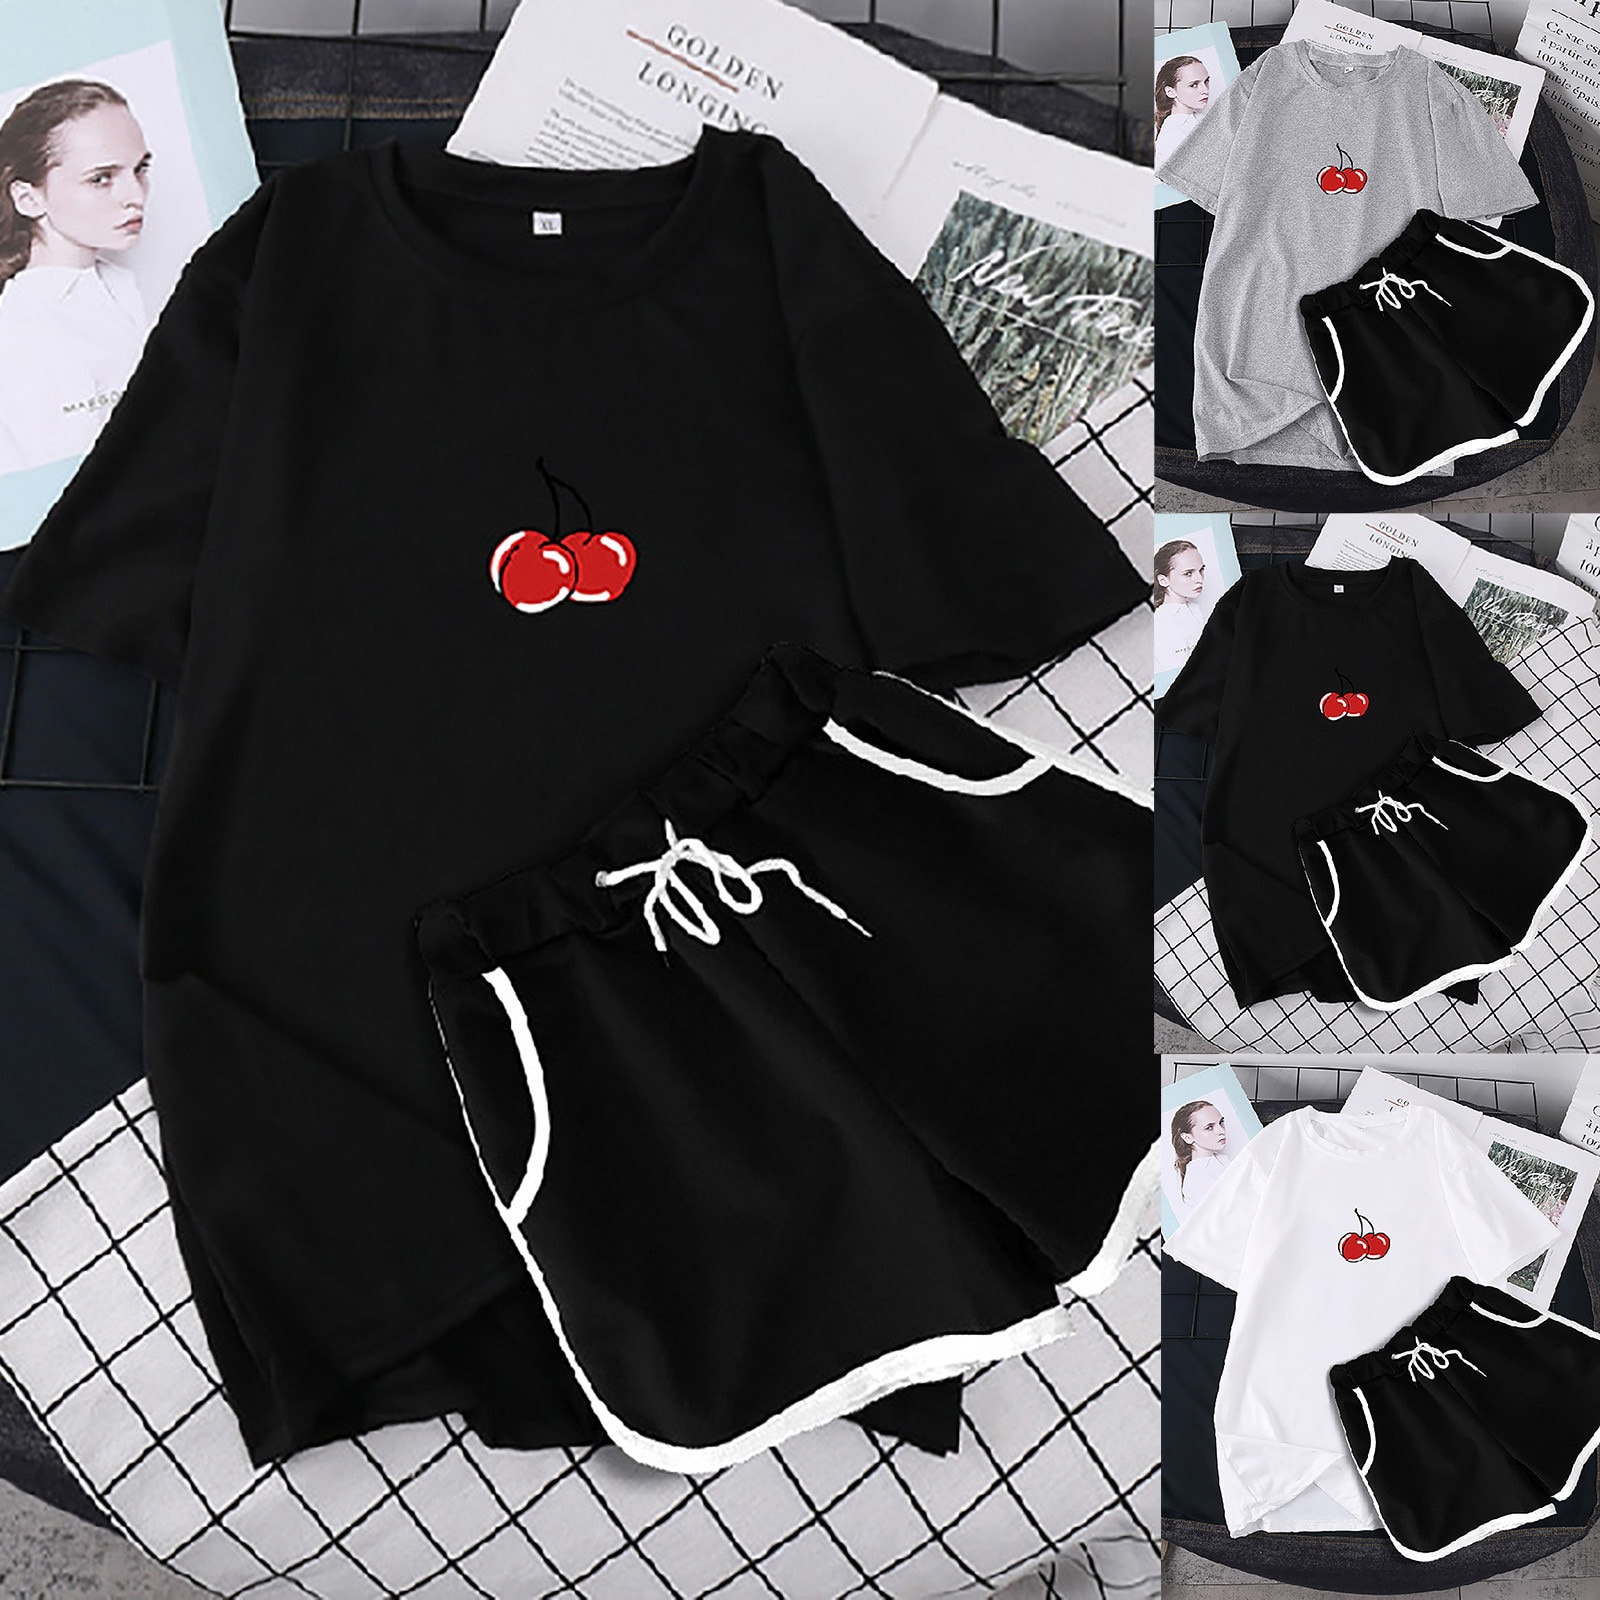 ISHOWTIENDA Women Two Piece Drop Sleeves Set Short Sleeve O-neck Paneled T Shirt Shorts Костюм Спортивн Женский Women Set